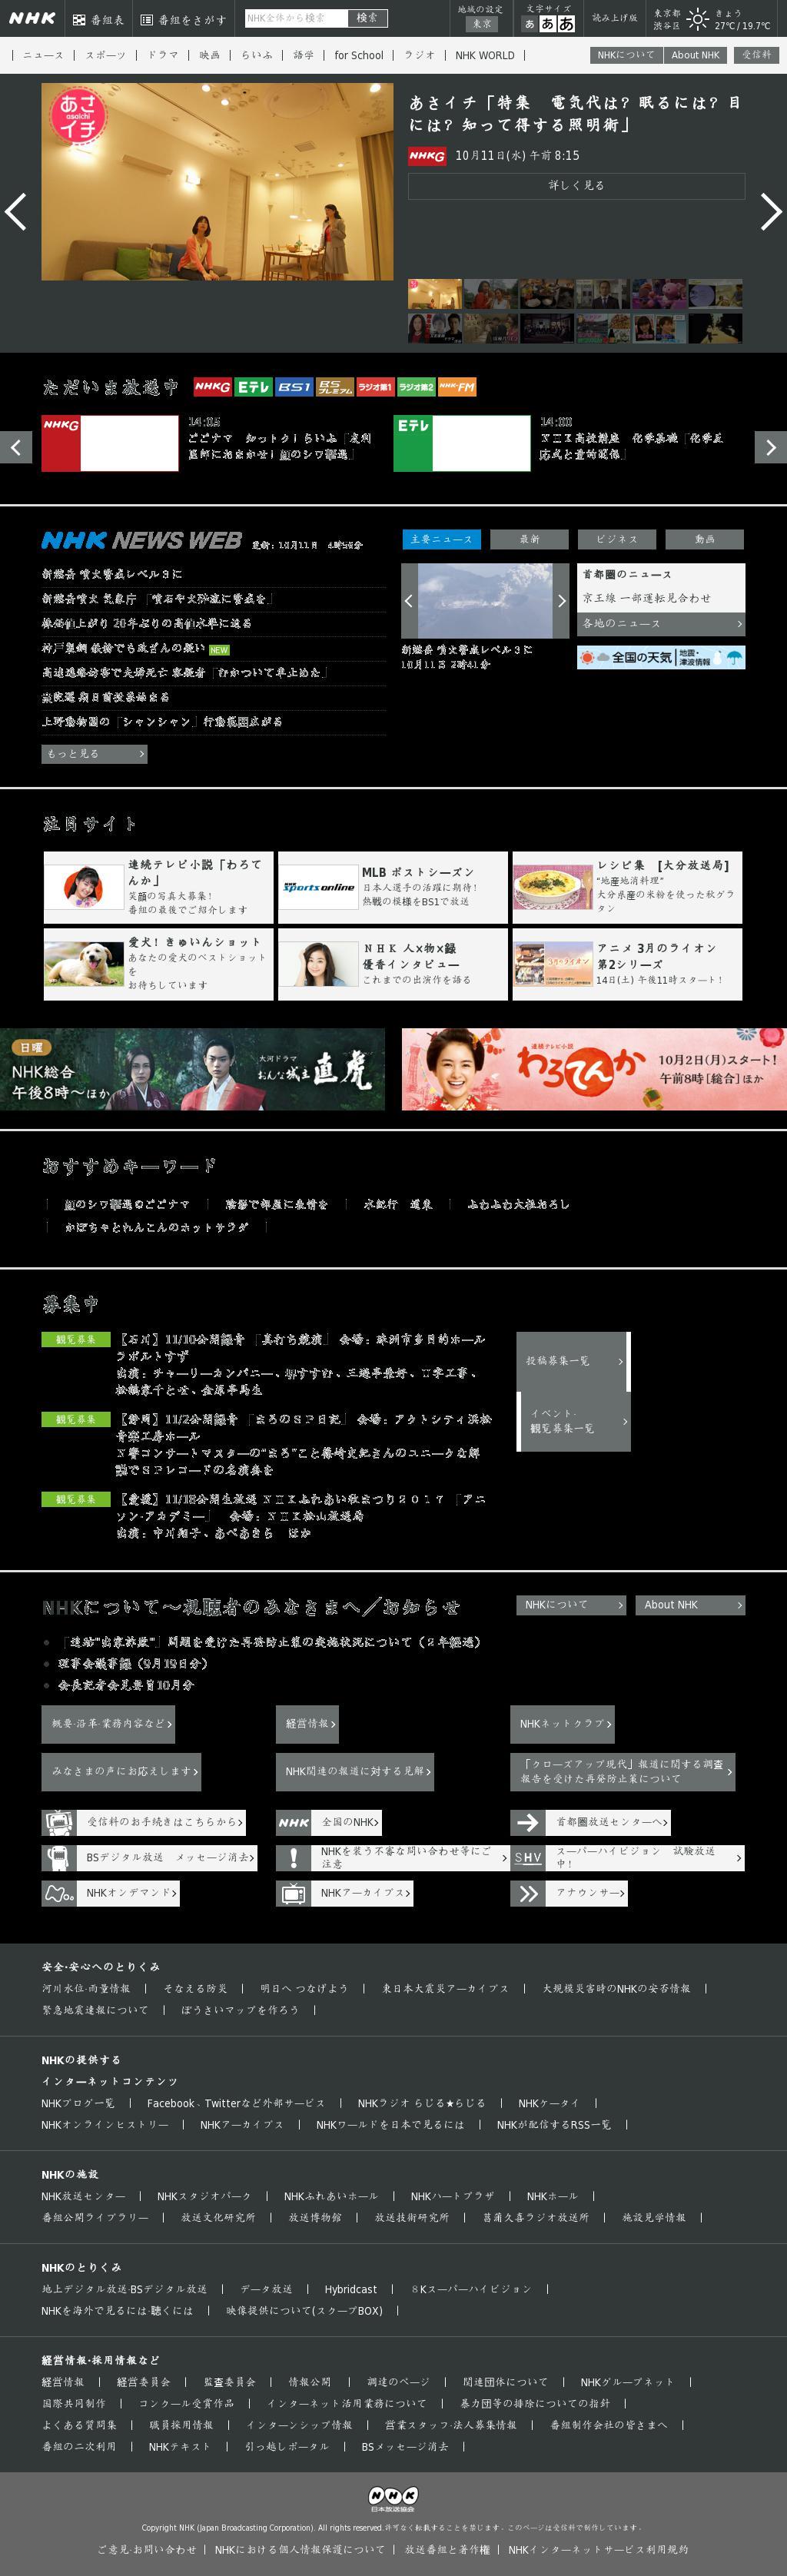 NHK Online at Wednesday Oct. 11, 2017, 5:09 a.m. UTC